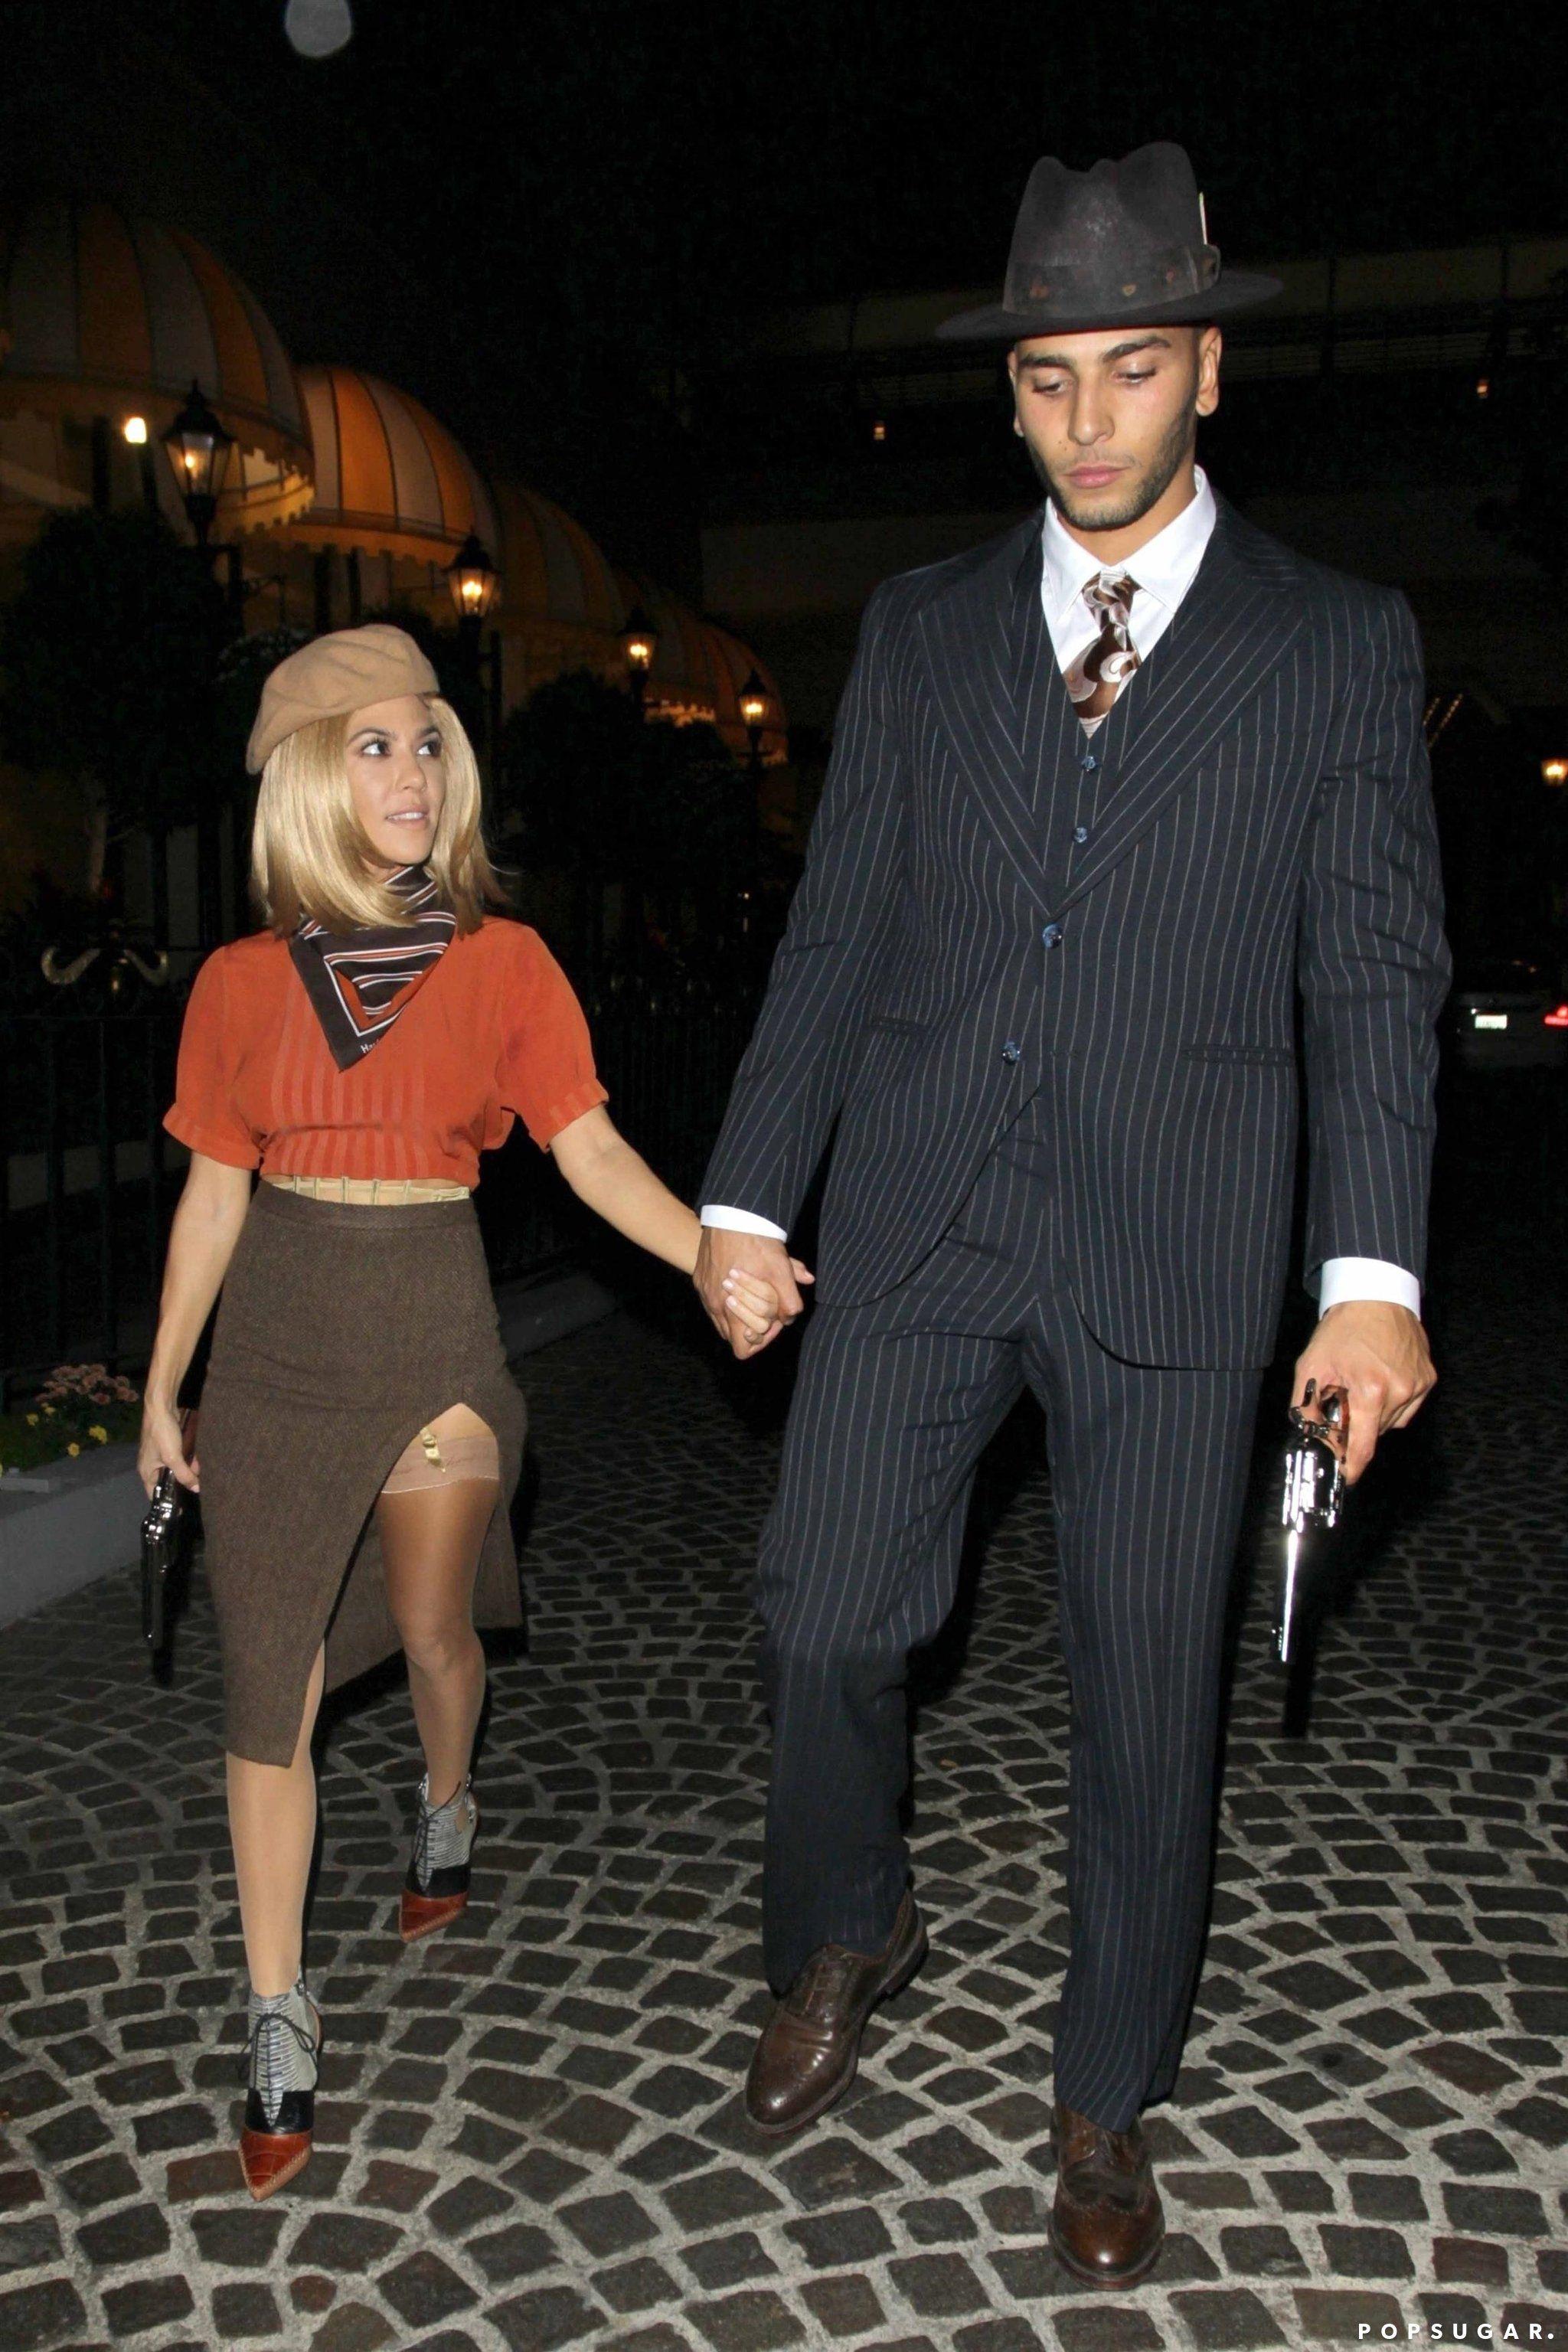 Kourtney Kardashian And Younes Bendjima As Bonnie And Clyde